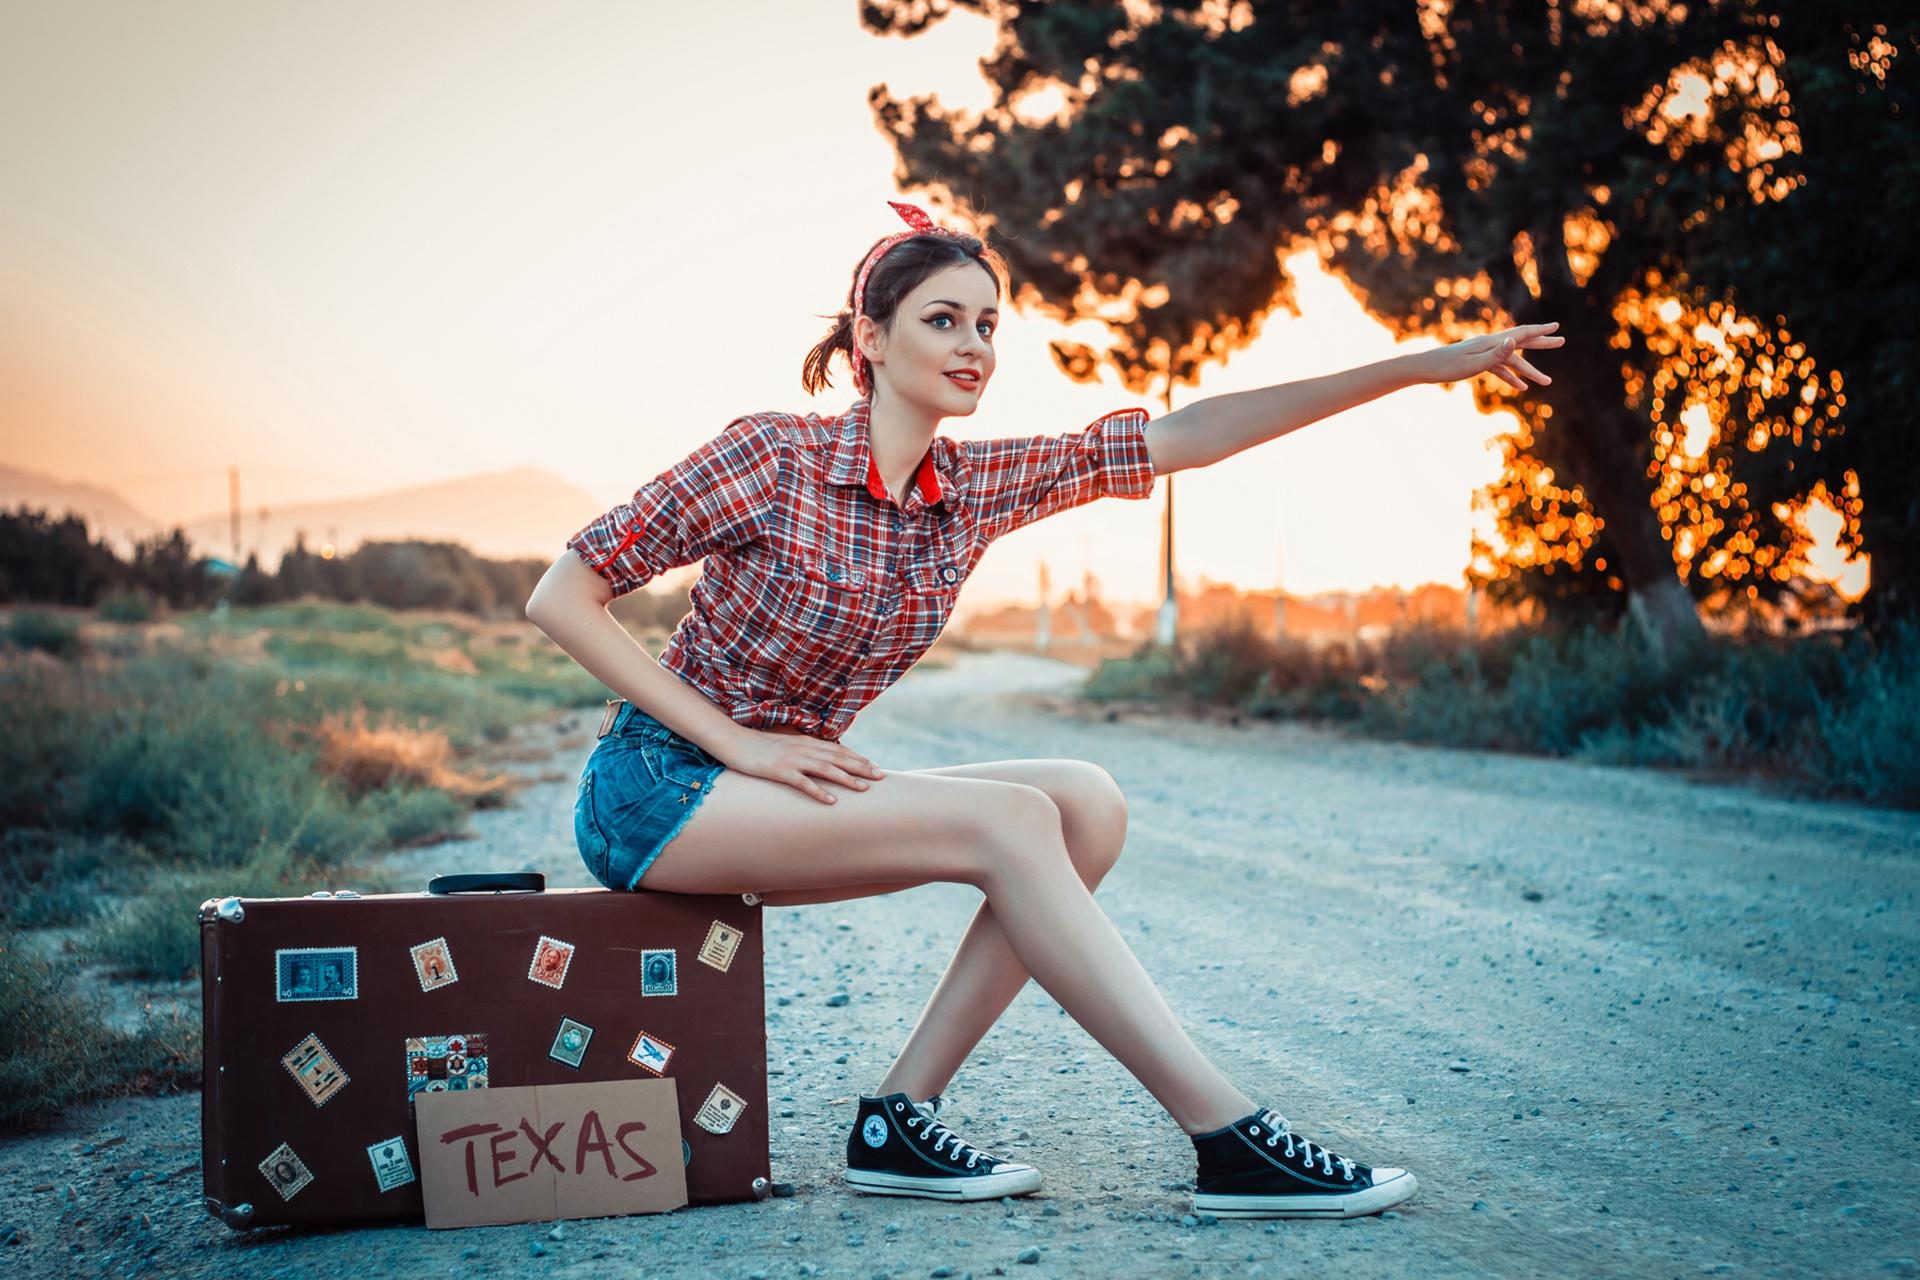 Картинка девушка сидит на чемодане